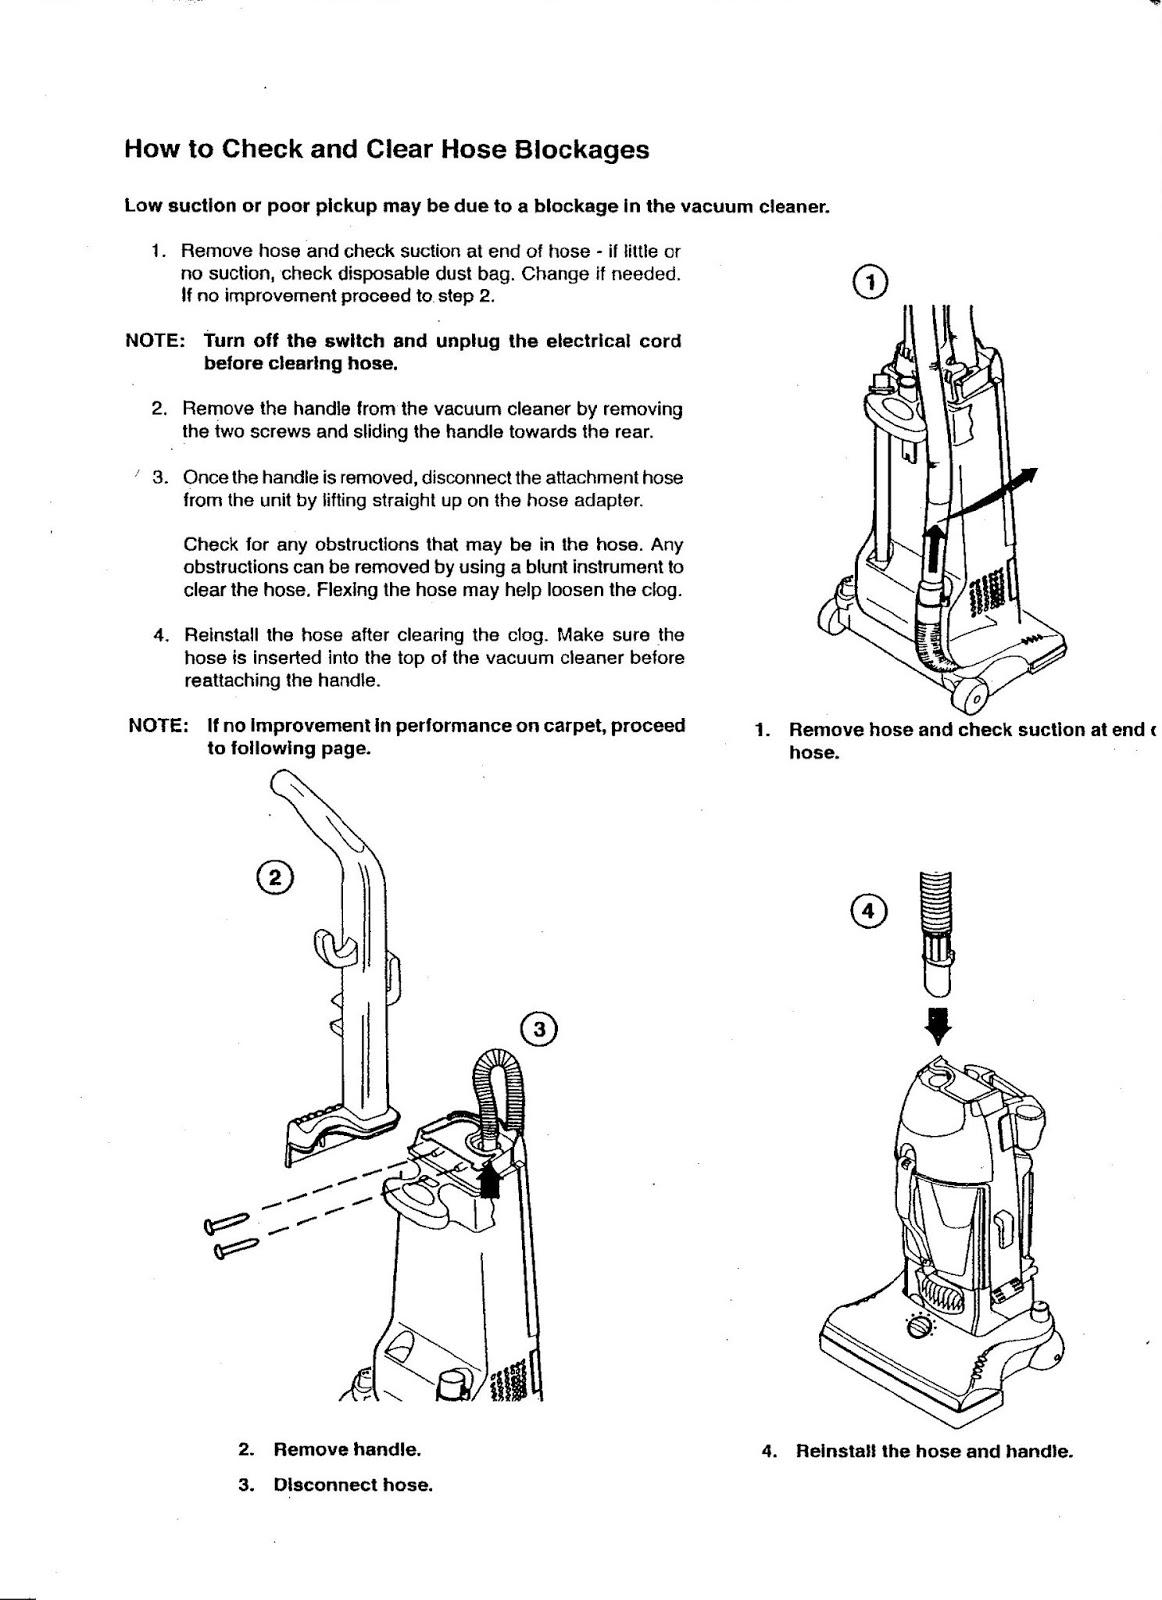 Electrolux 'The Boss' B4390 Instruction Manual